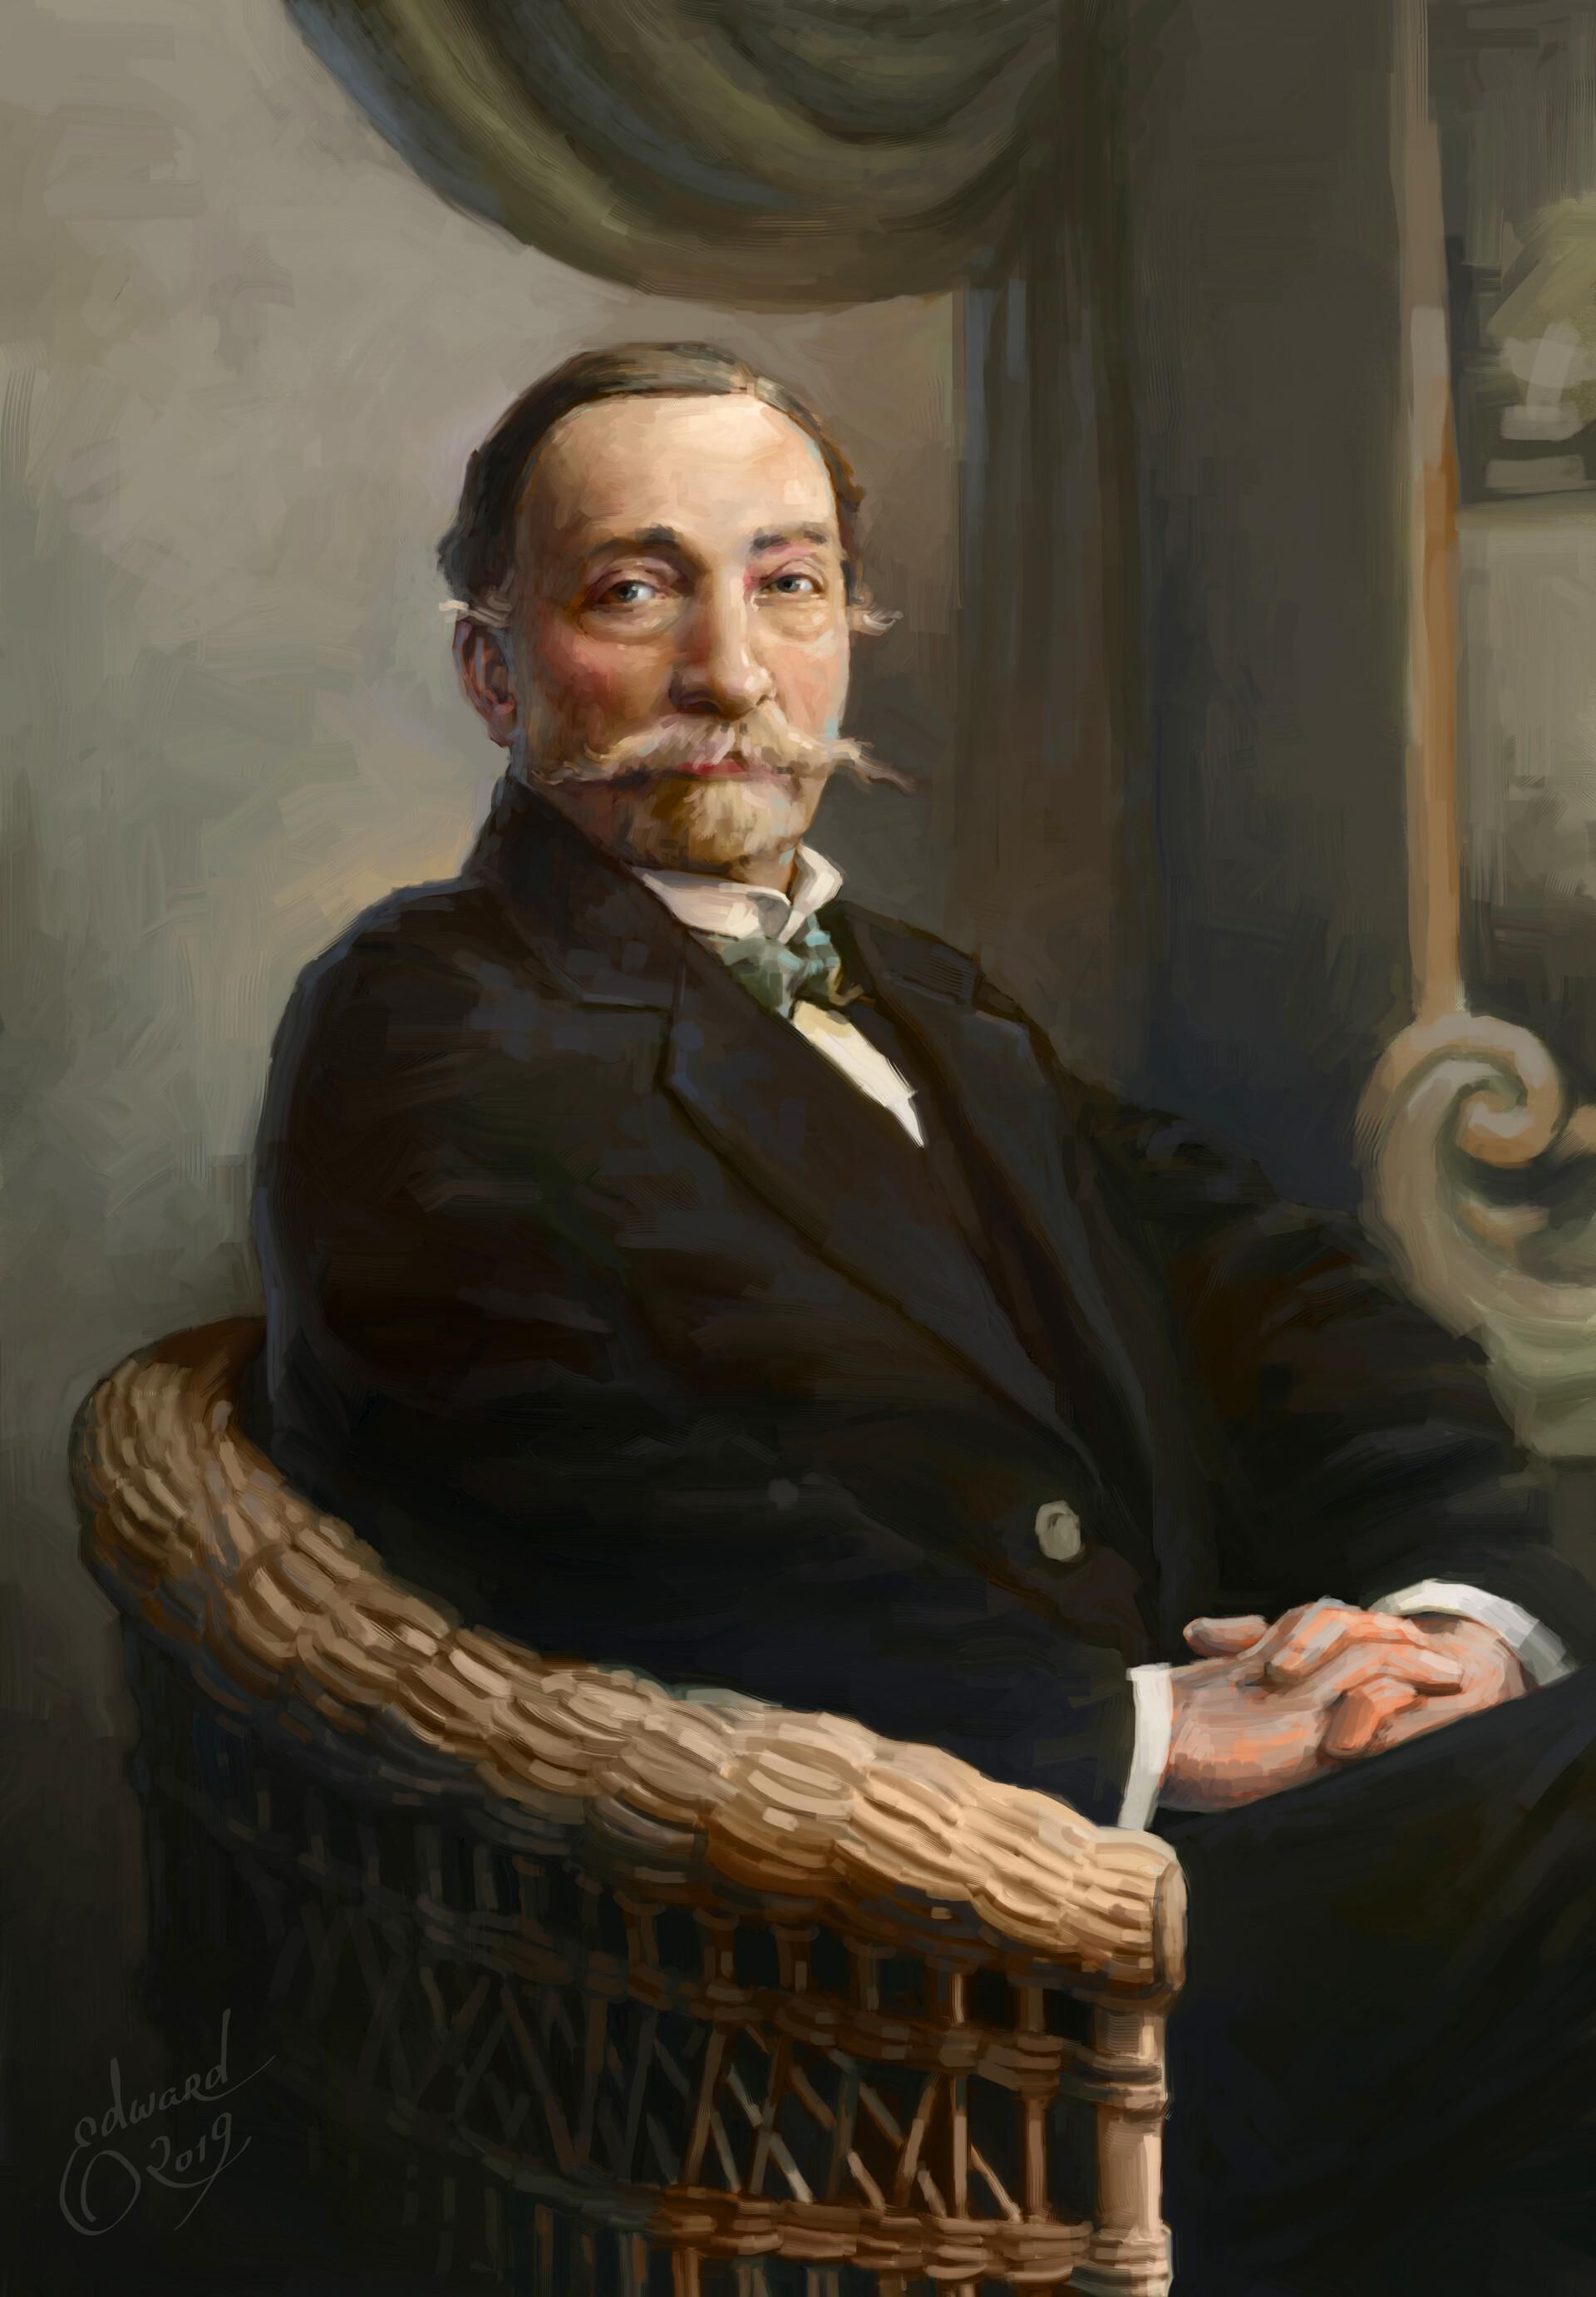 Edward halmurzaev 2